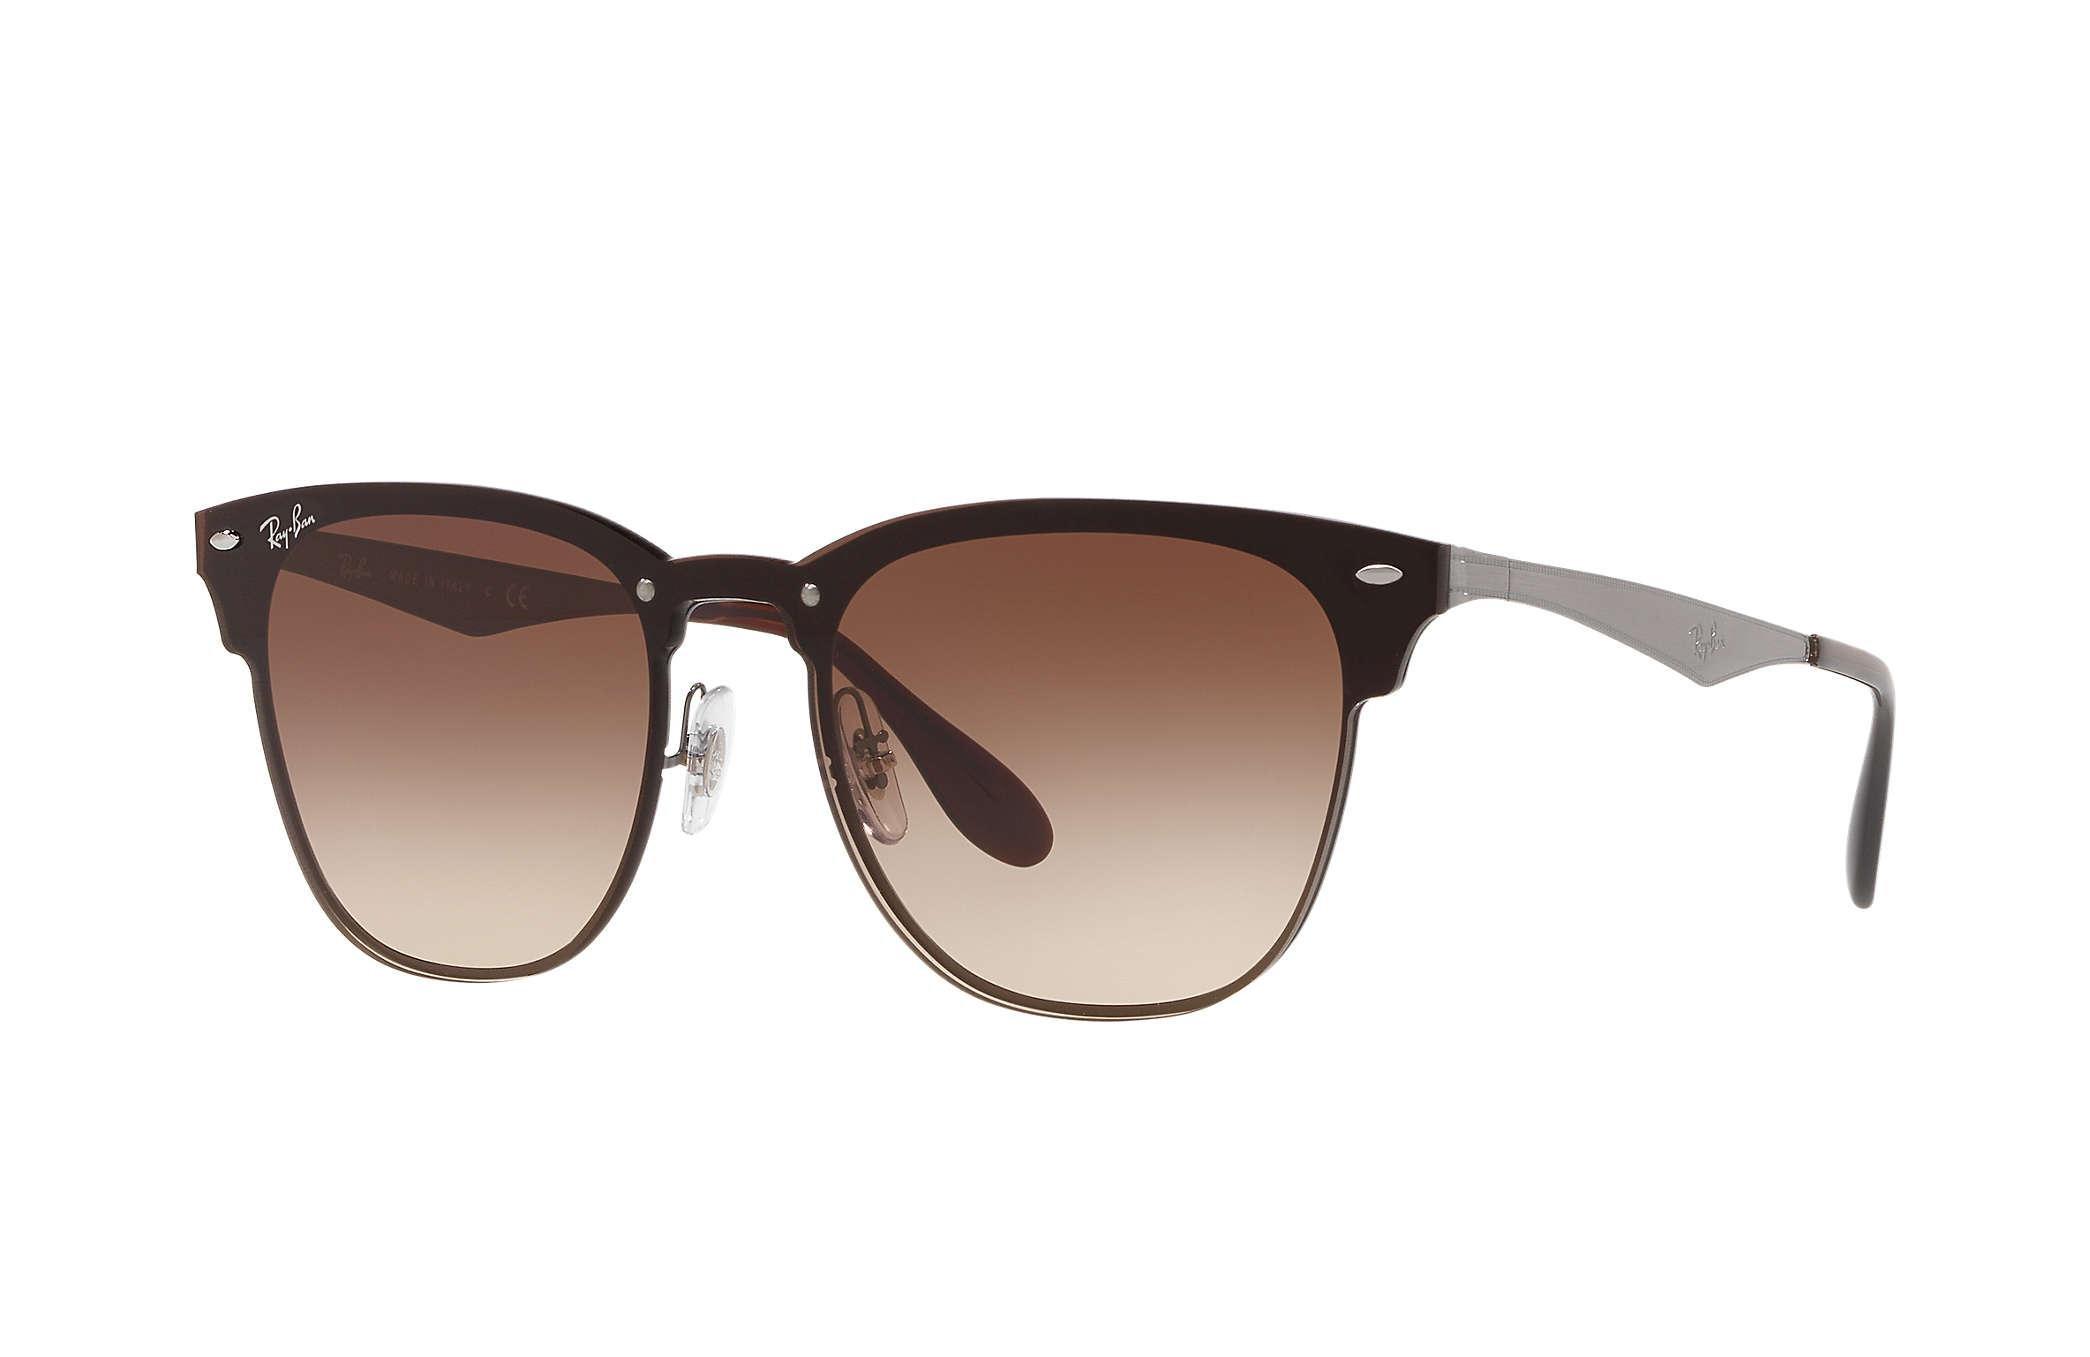 b352addf3814c Ray-Ban Blaze Clubmaster Sunglasses in Brown for Men - Lyst